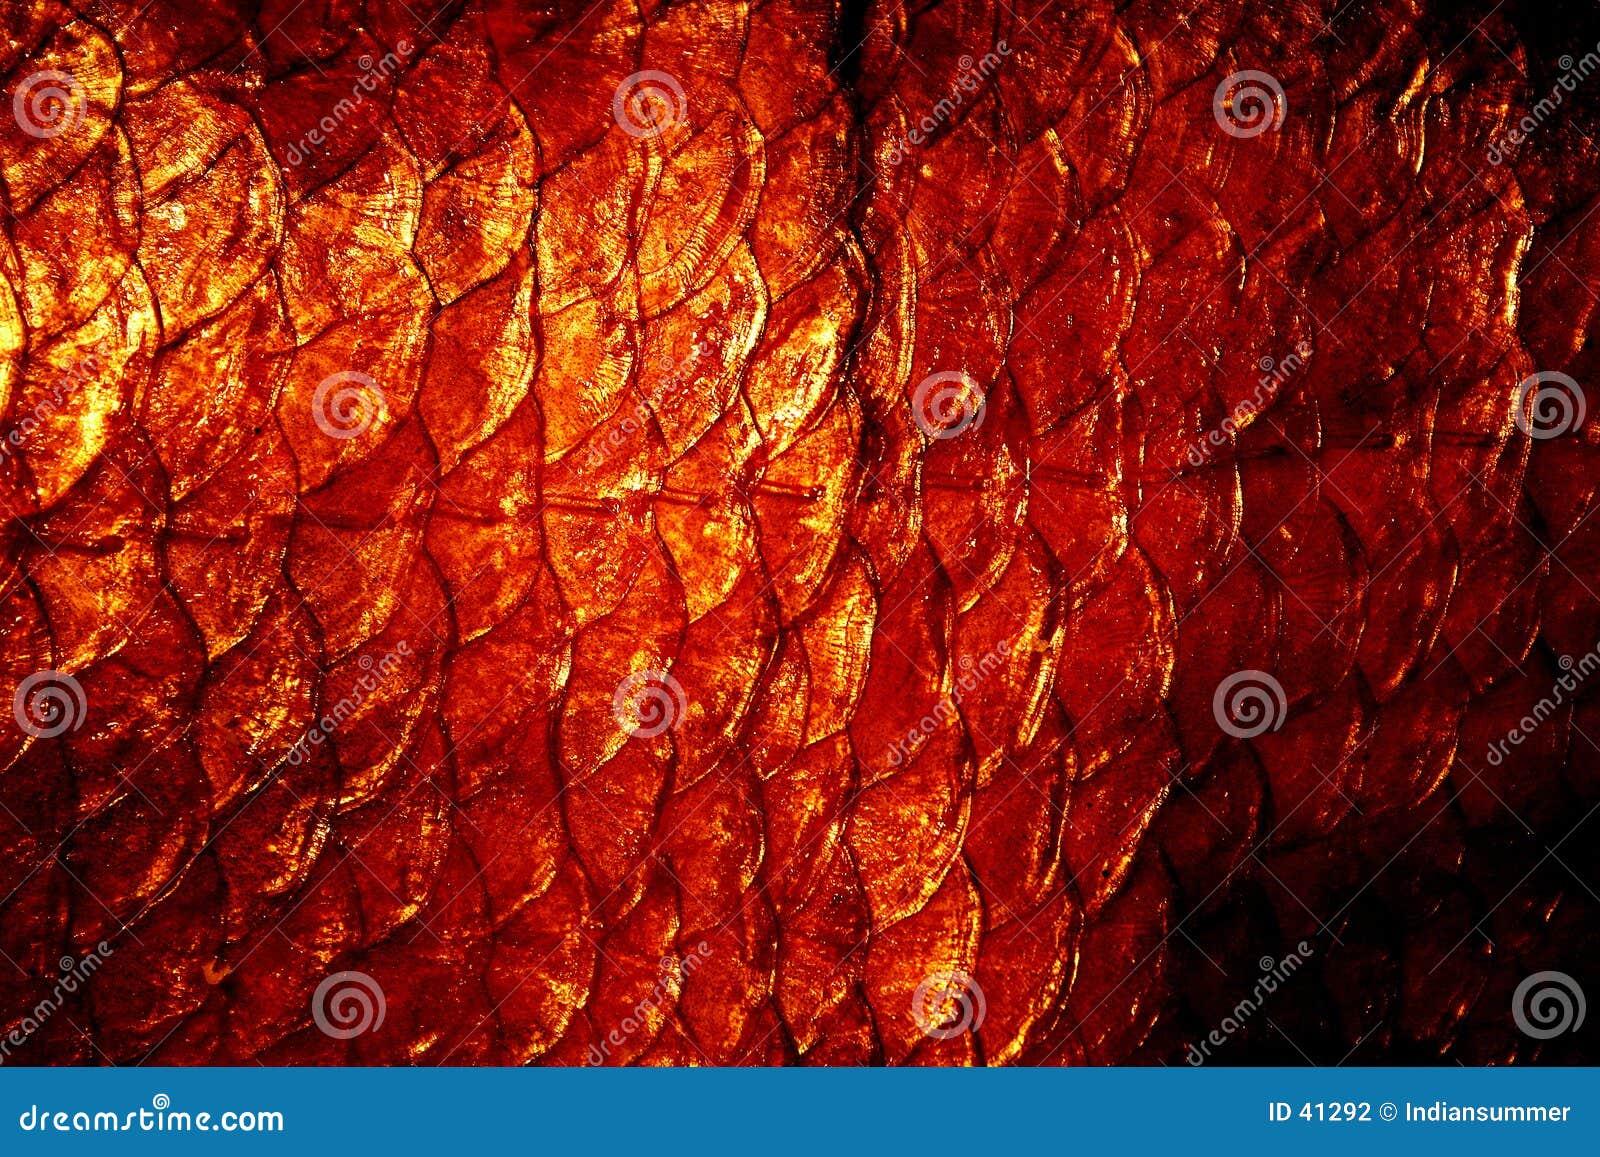 Natural exuviae texture